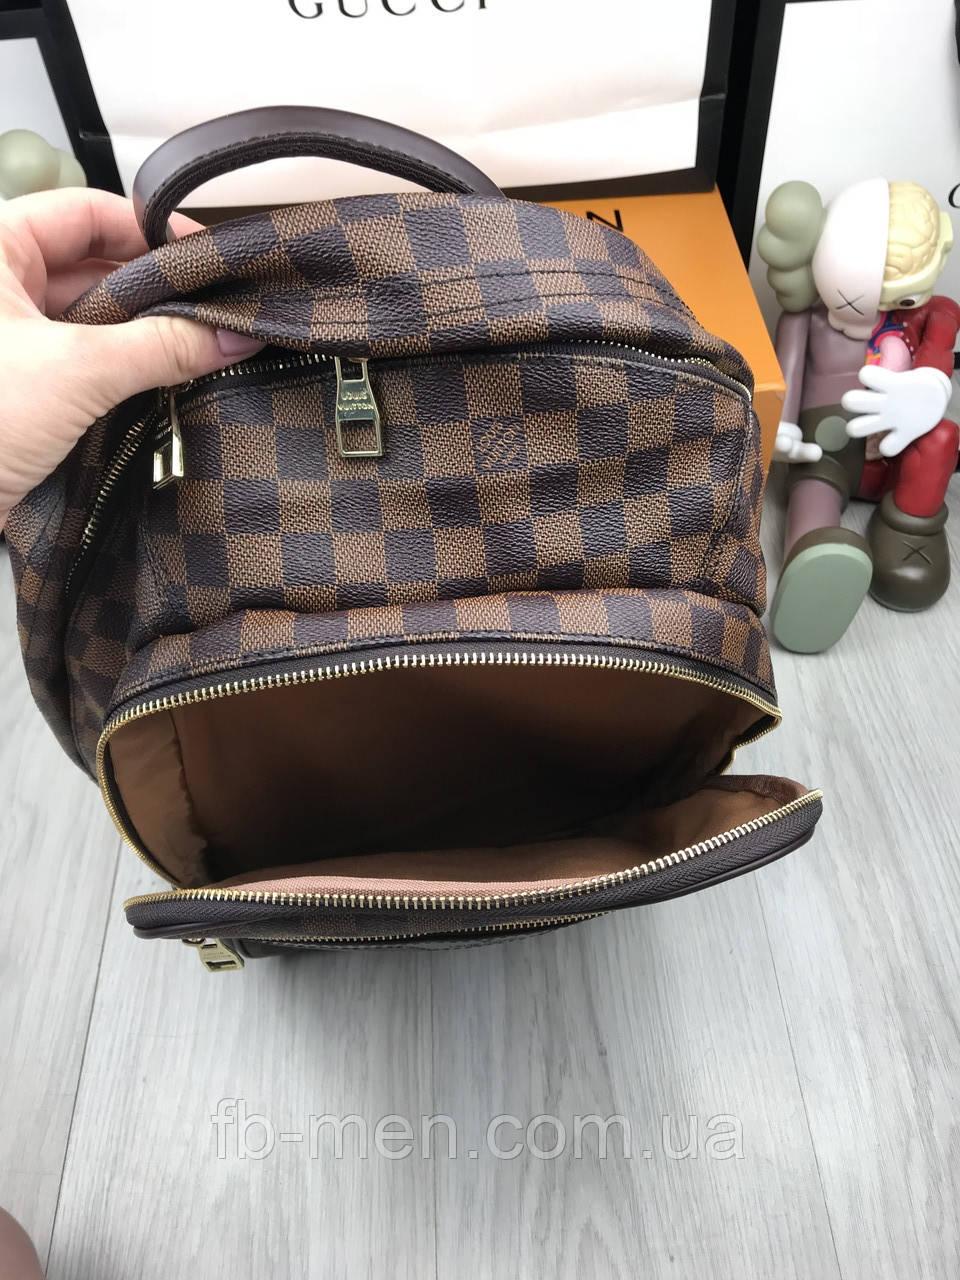 901d6ba91b35 Рюкзак Louis Vuitton, цена 1 550 грн., купить в Одессе — Prom.ua  (ID#776772623)